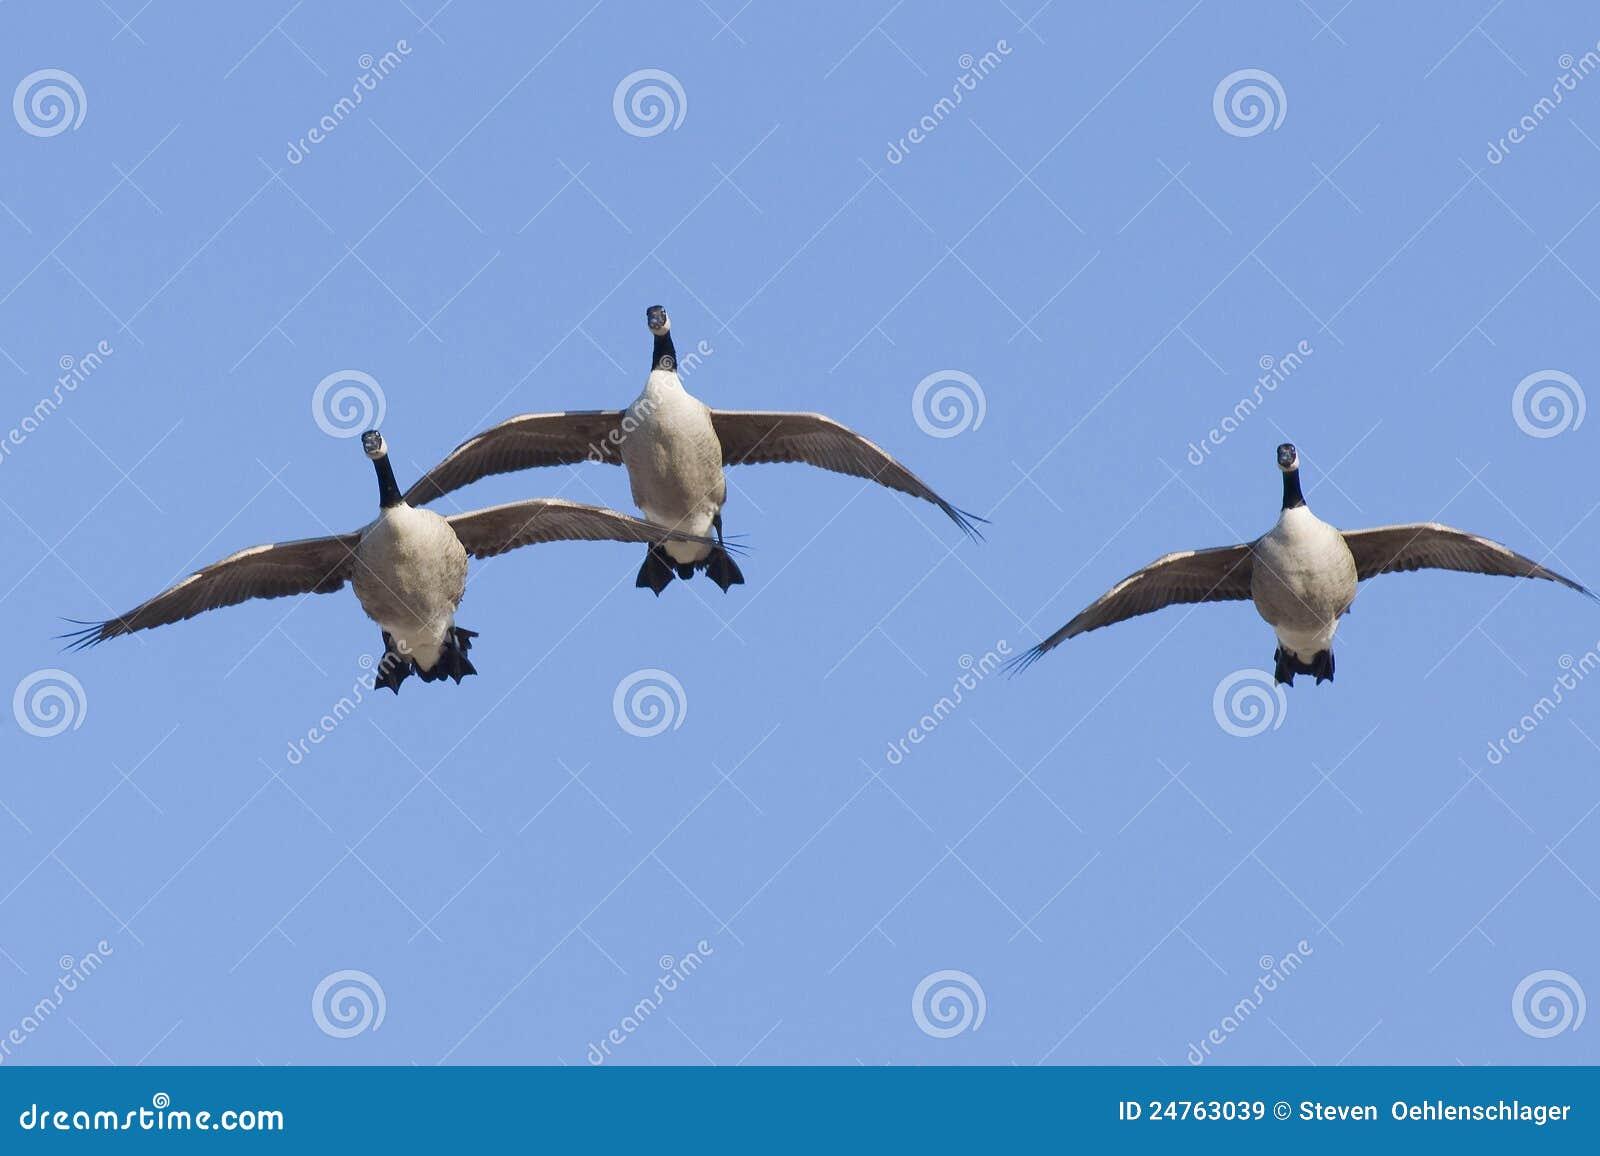 Trio of Landing Geese